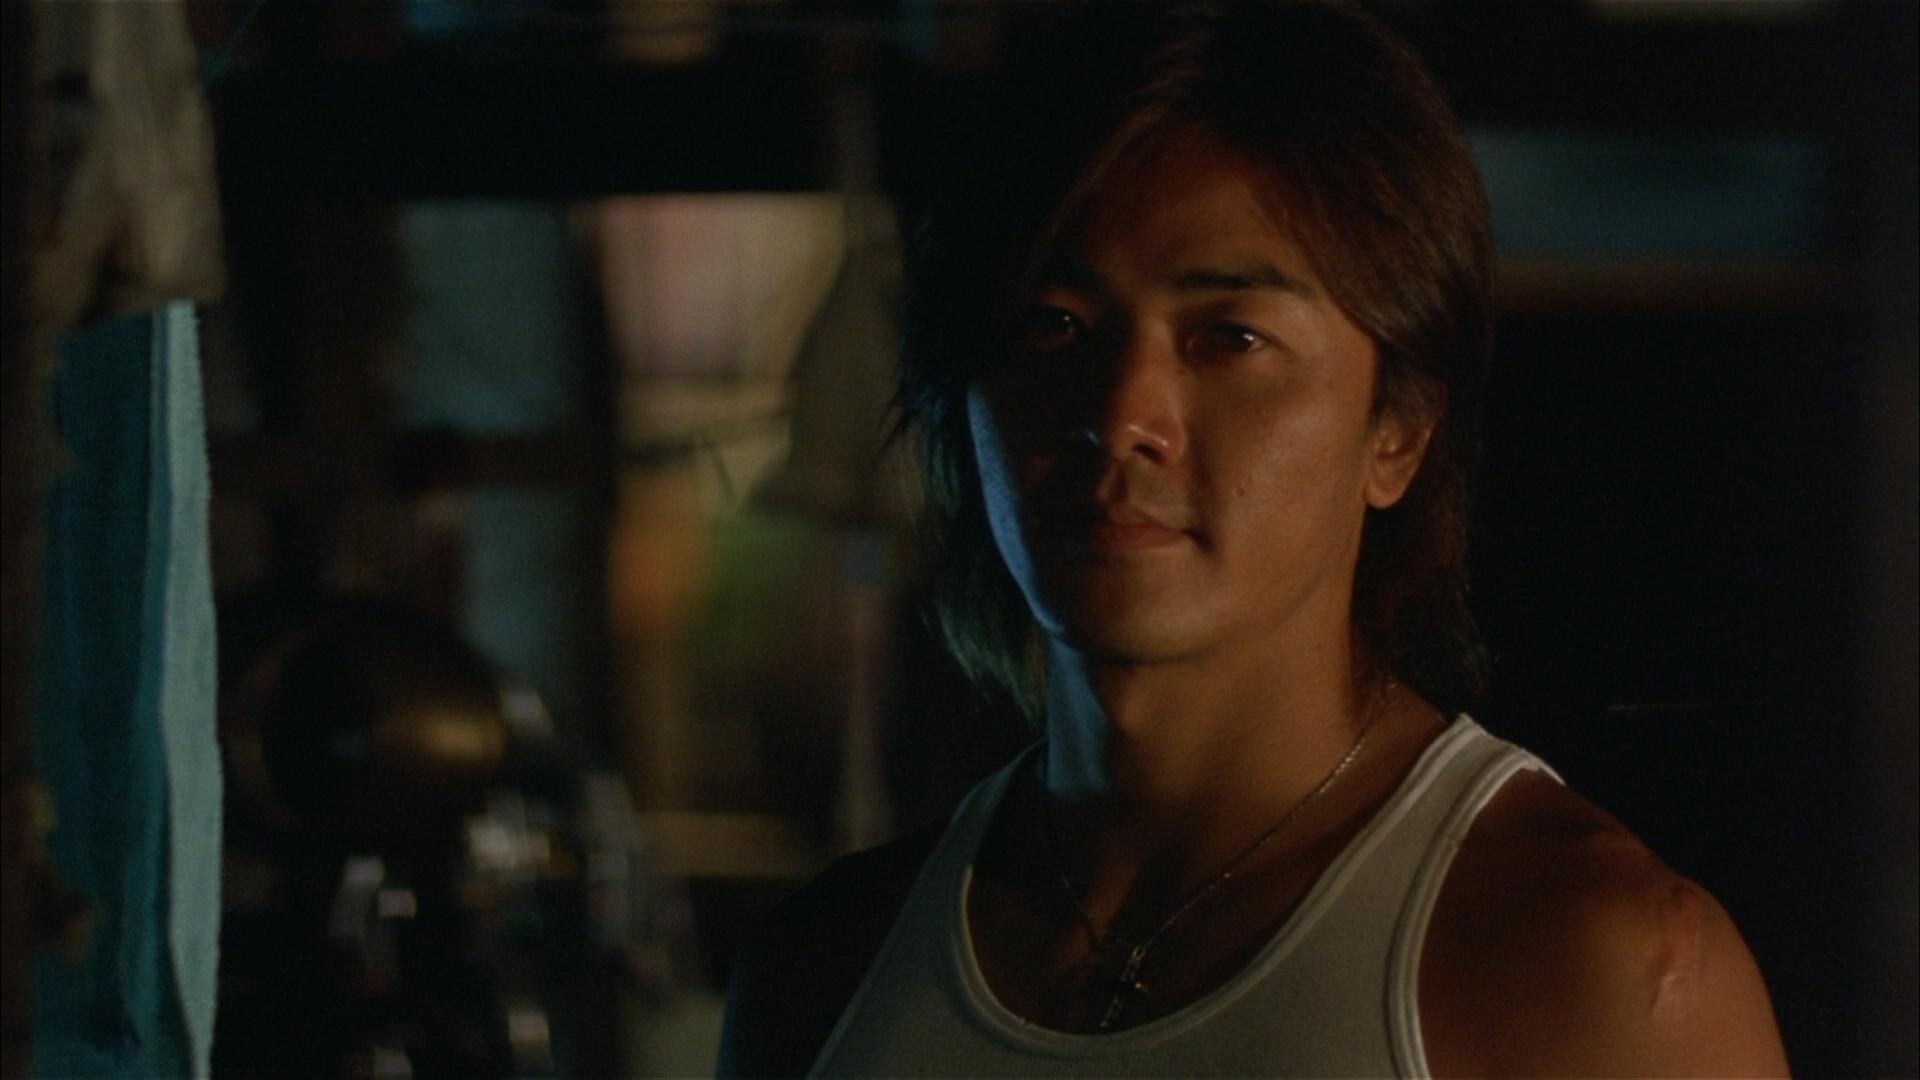 Ekin Cheng in Lit foh chin che 2: Git suk chuen suet (1999)